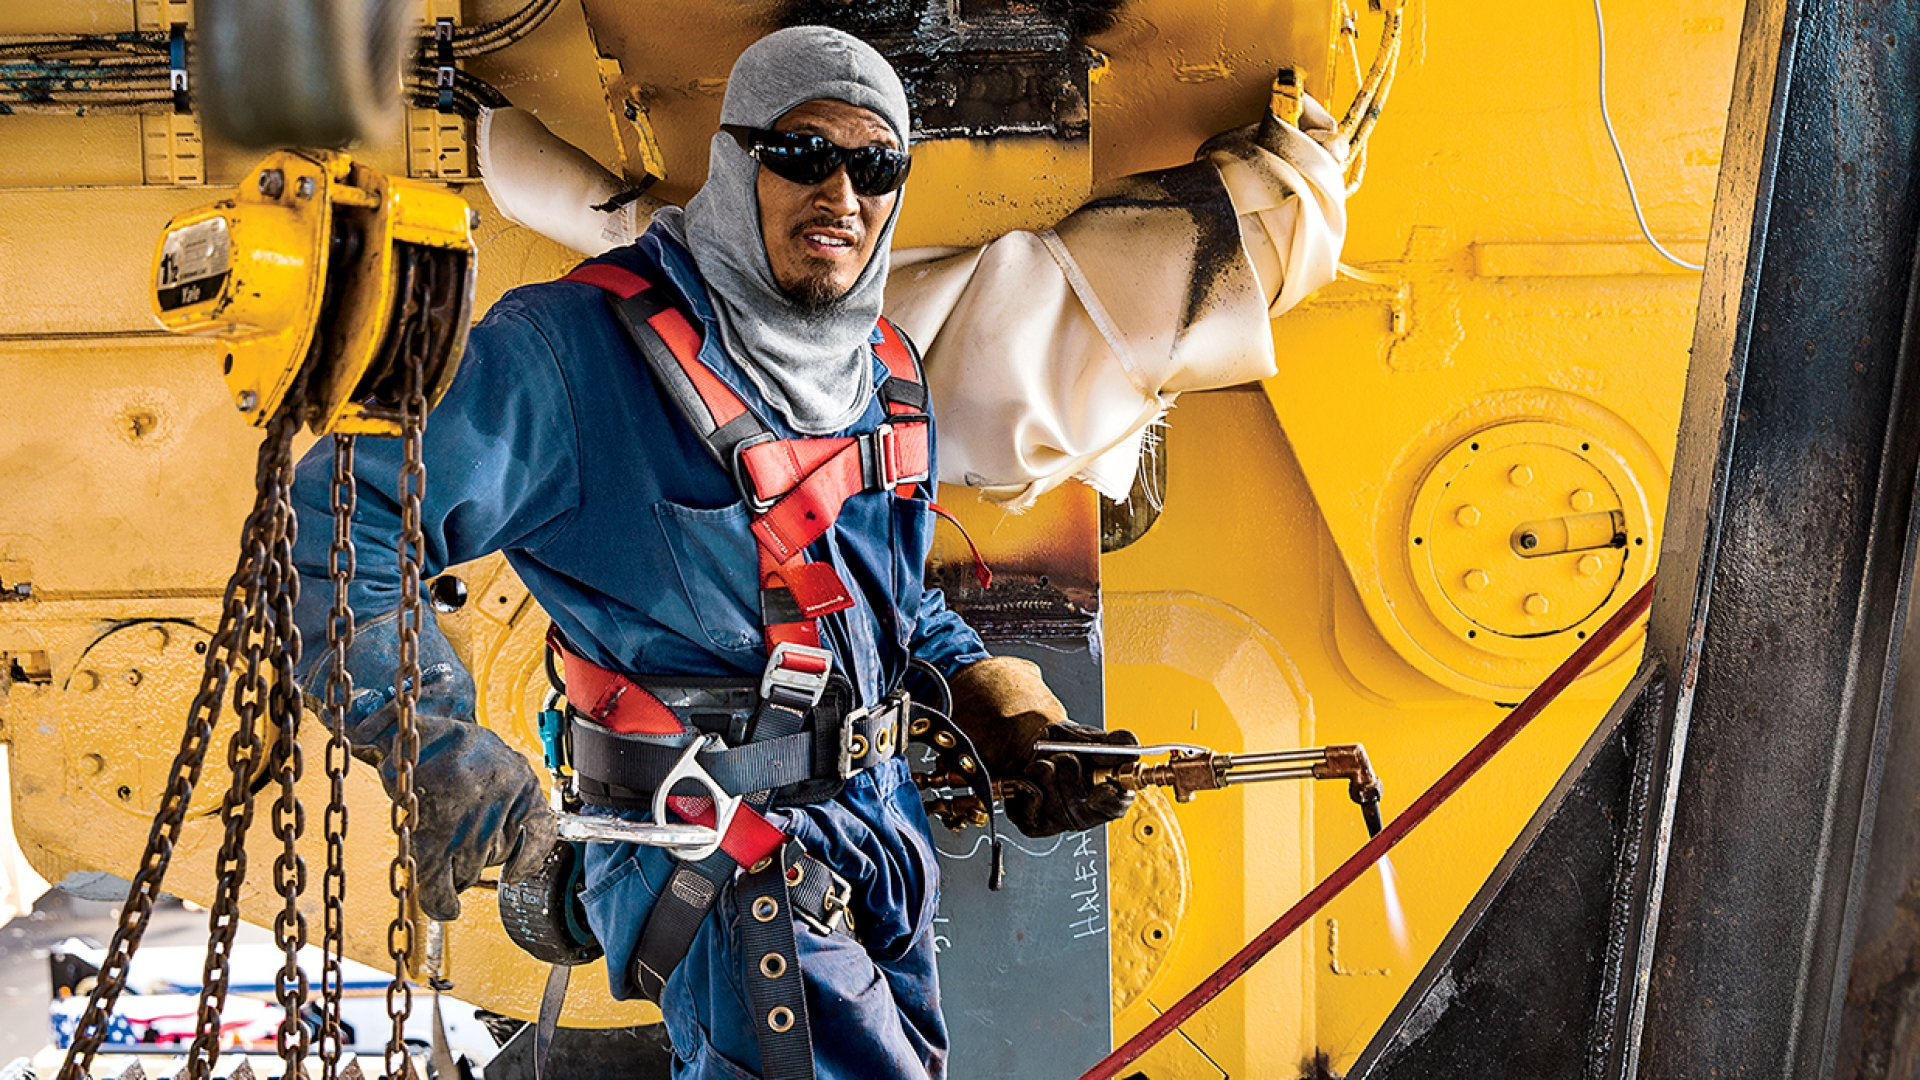 A Regal Service Company welder works on the container vessel <em>Haleakala</em> in Honolulu Harbor.